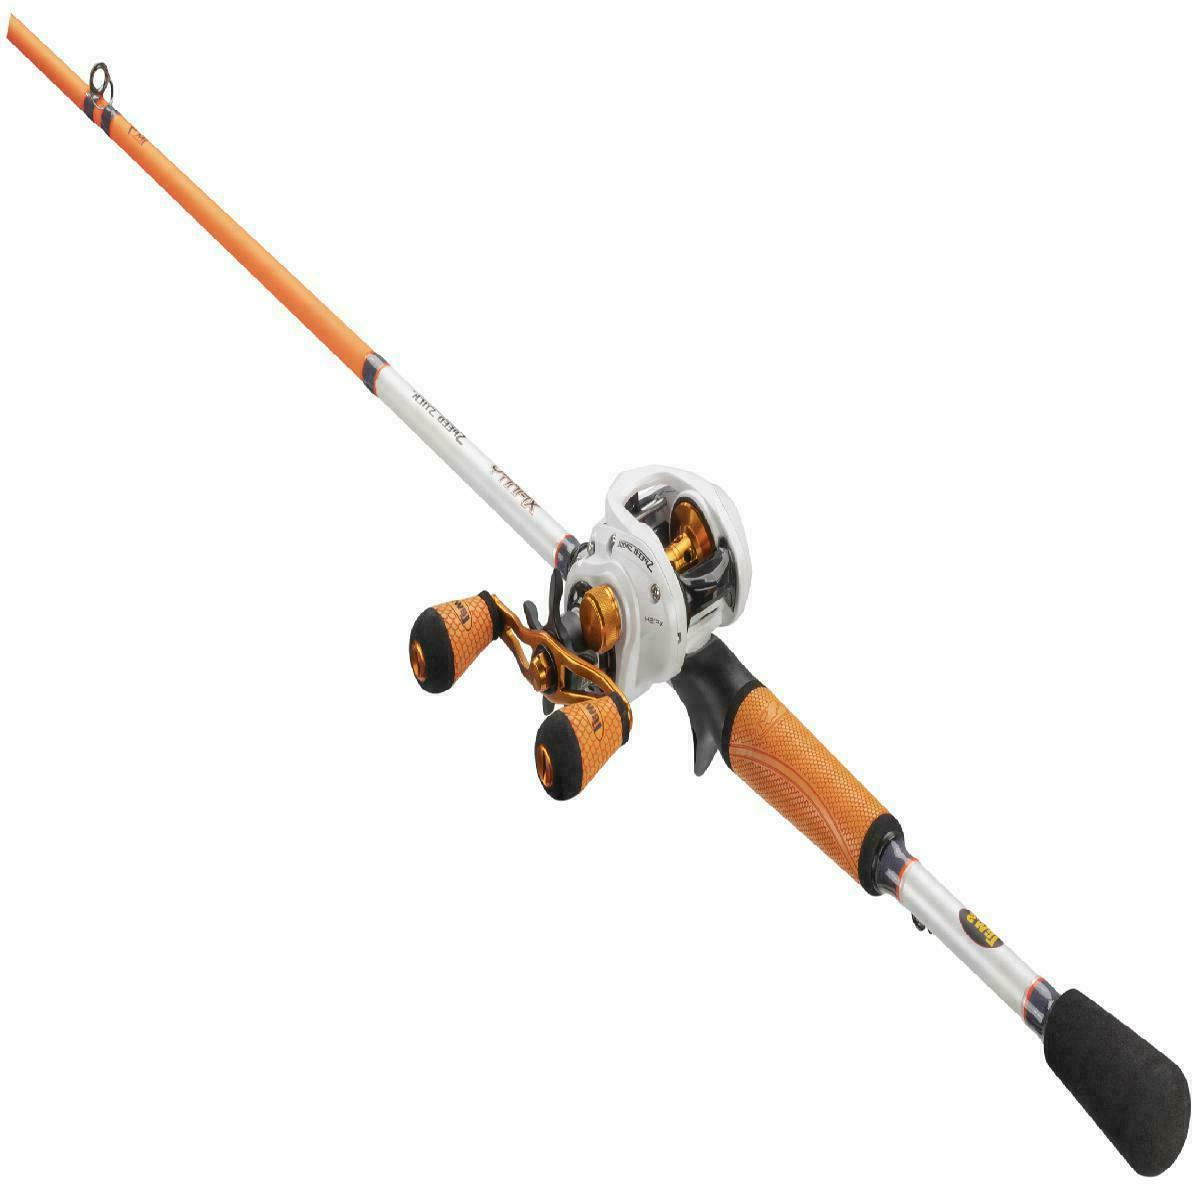 Lews Xfinity Speed Spool Baitcast Fishing Rod and Reel Combo